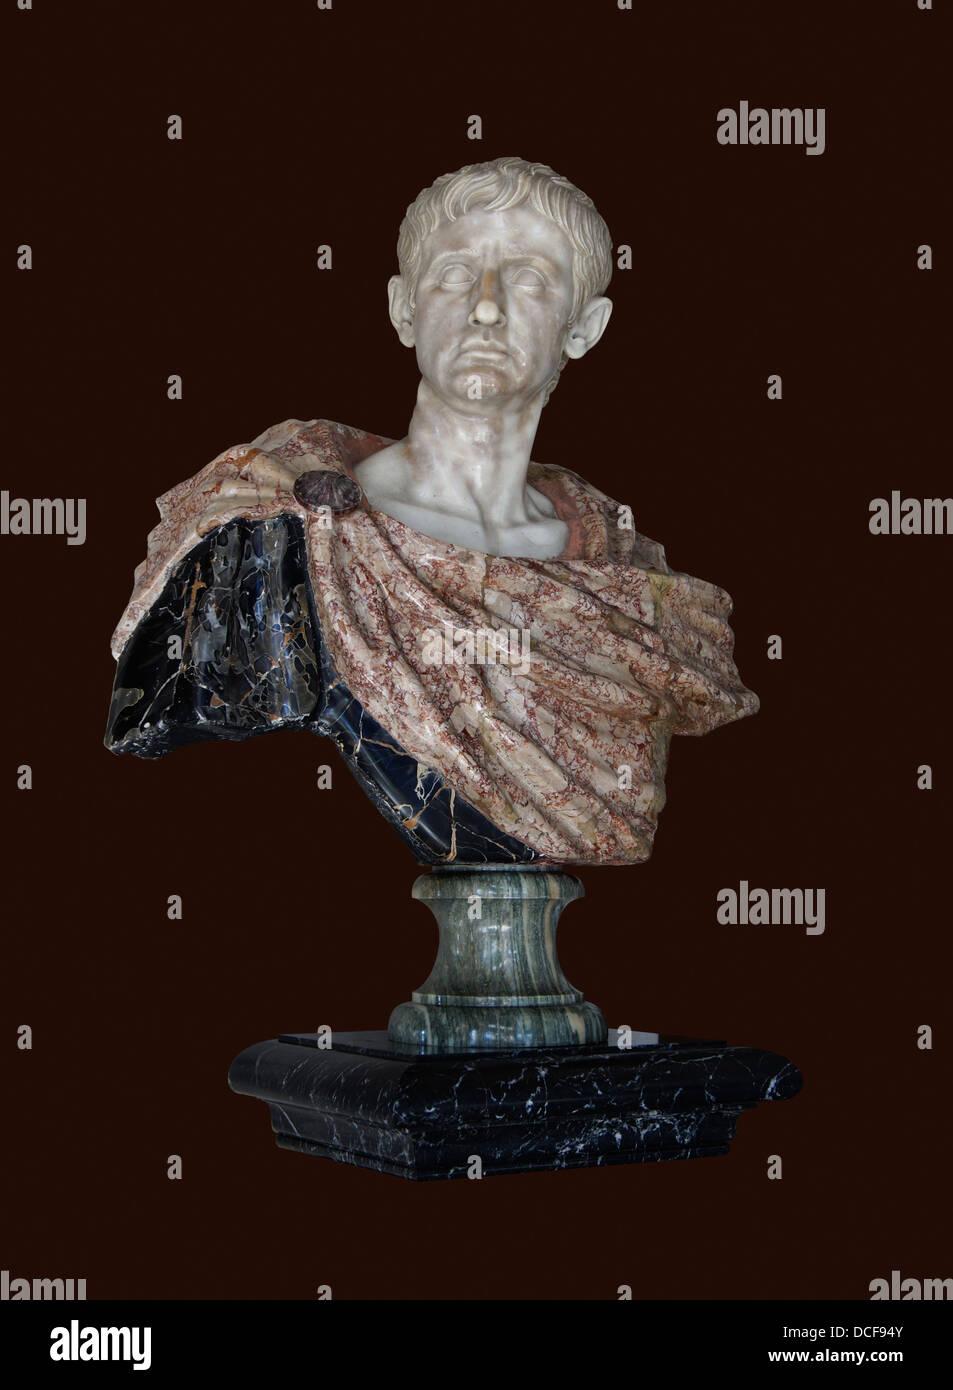 Marcus Ulpius Nerva Traianus. Römischen Kaiser Trajan (53-117). Florentiner Büste. Stockbild